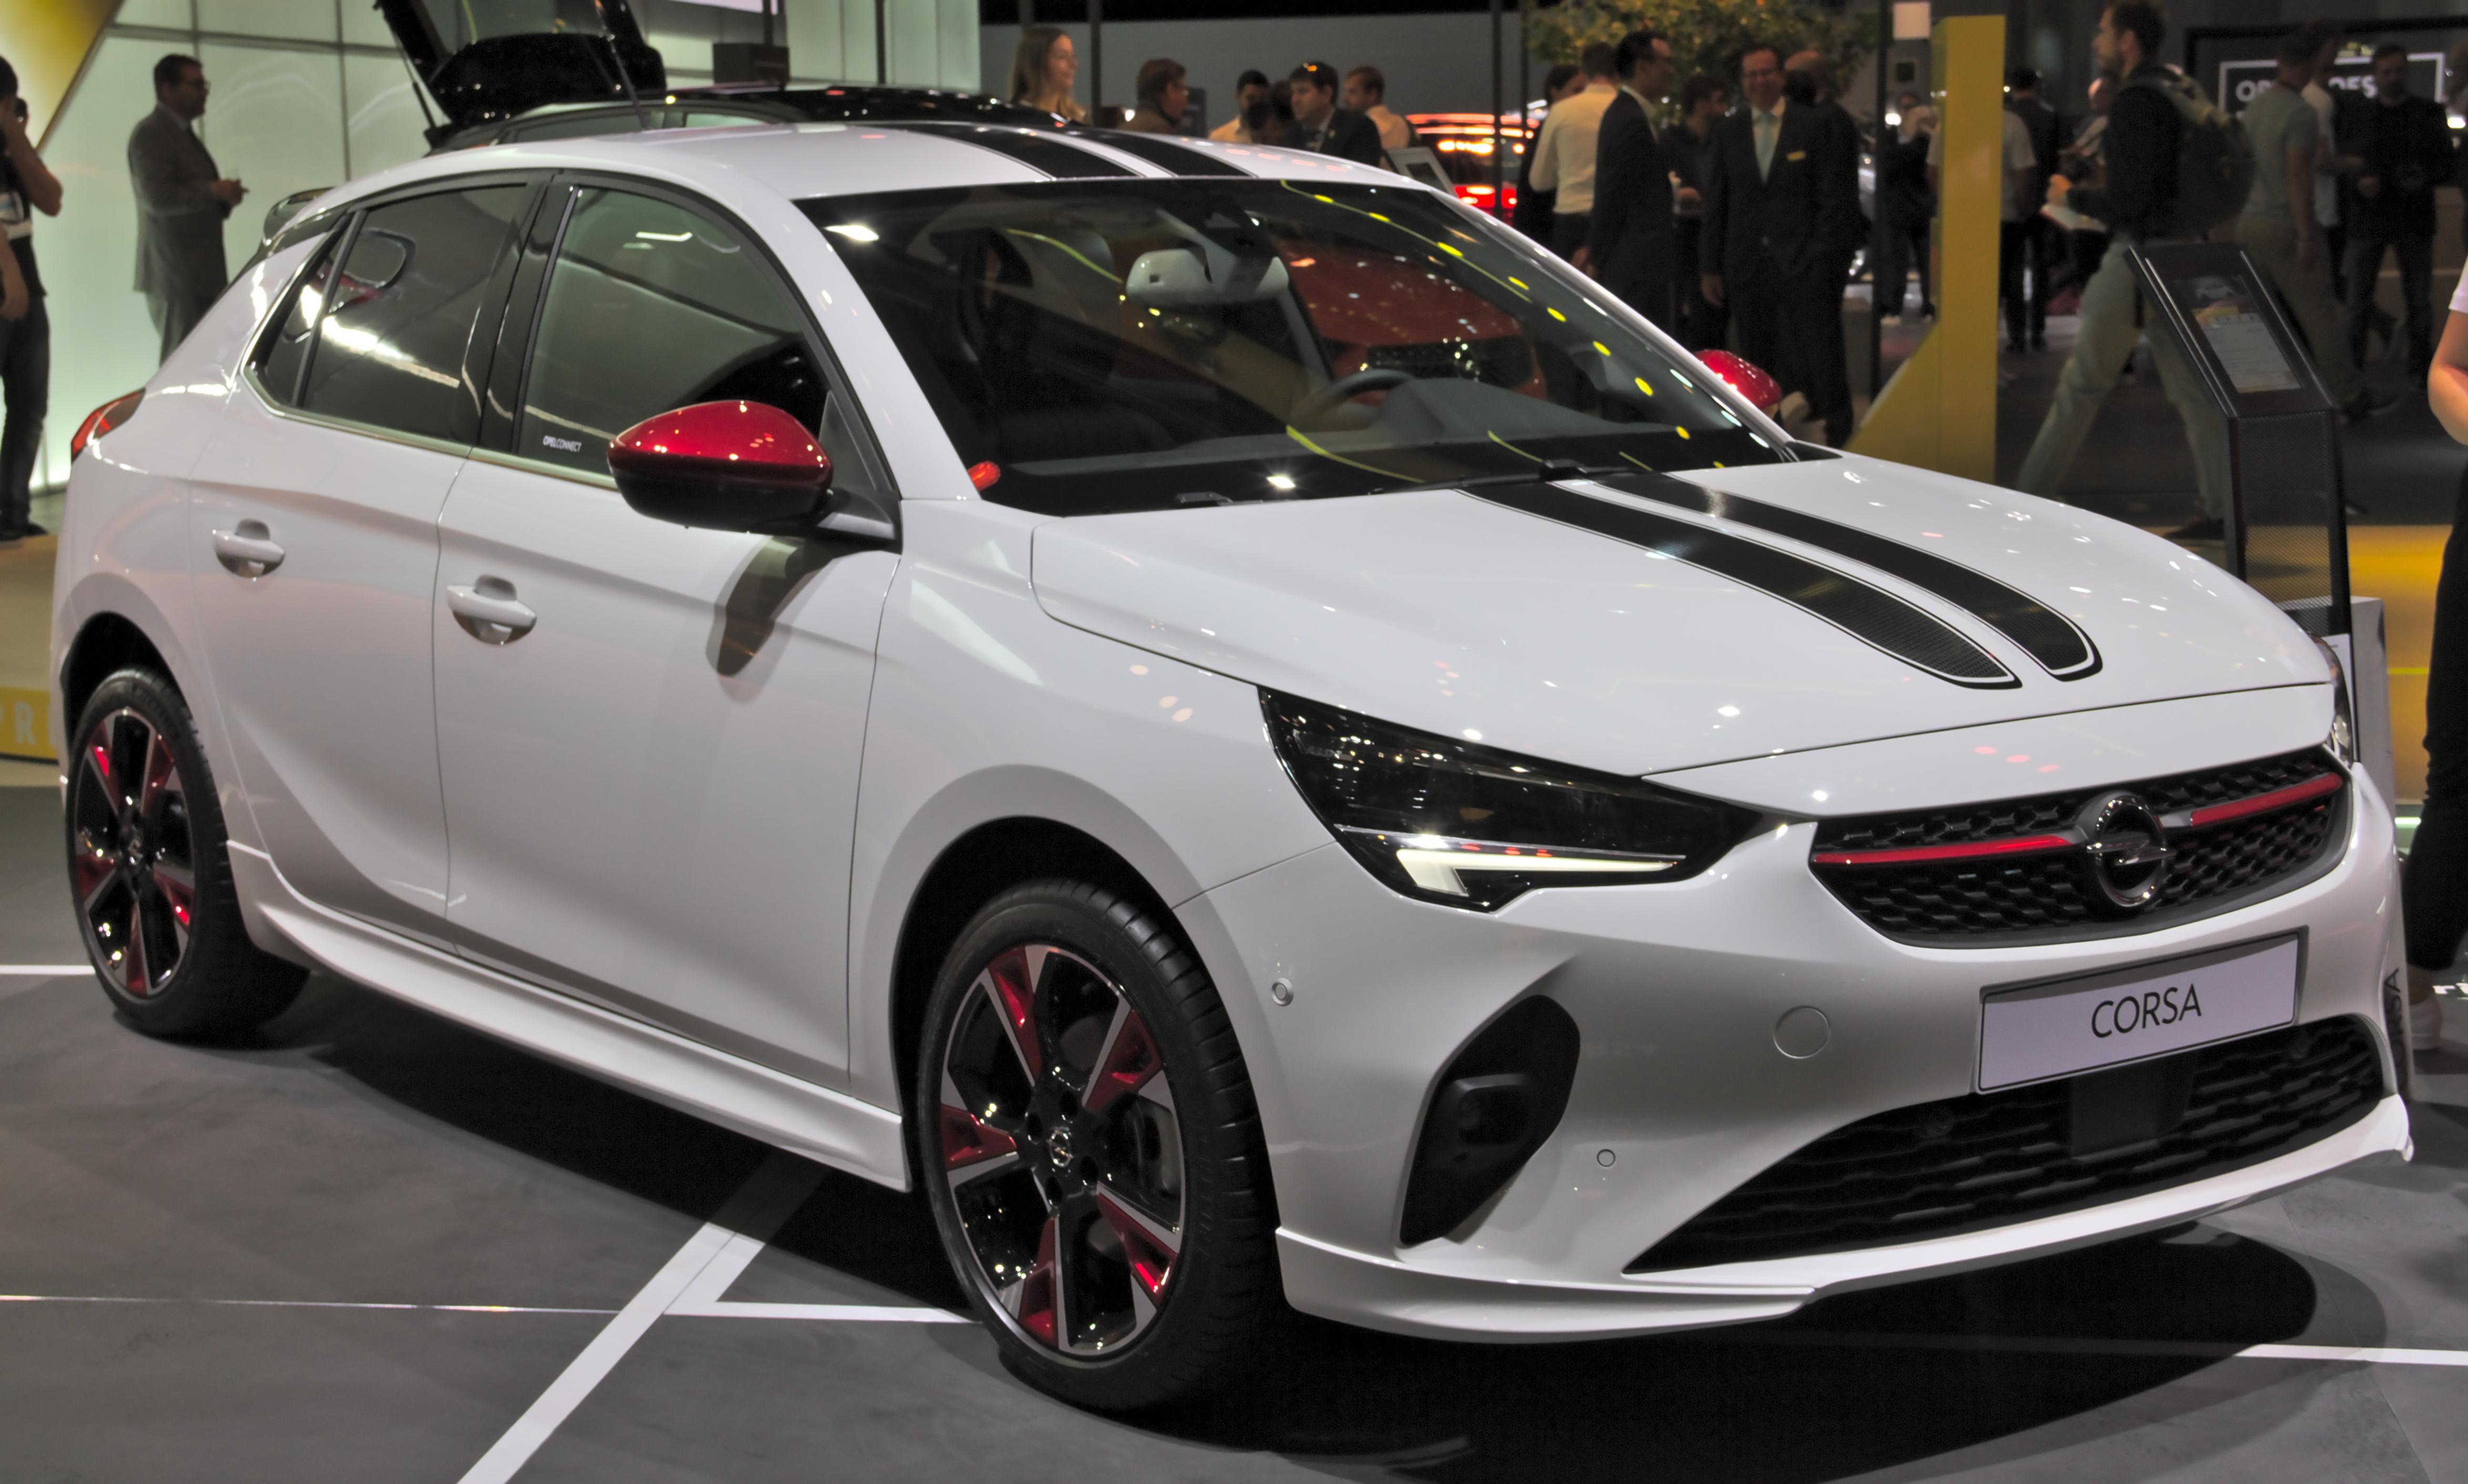 File:Opel Corsa F at IAA 2019 IMG 0693.jpg - Wikimedia Commons